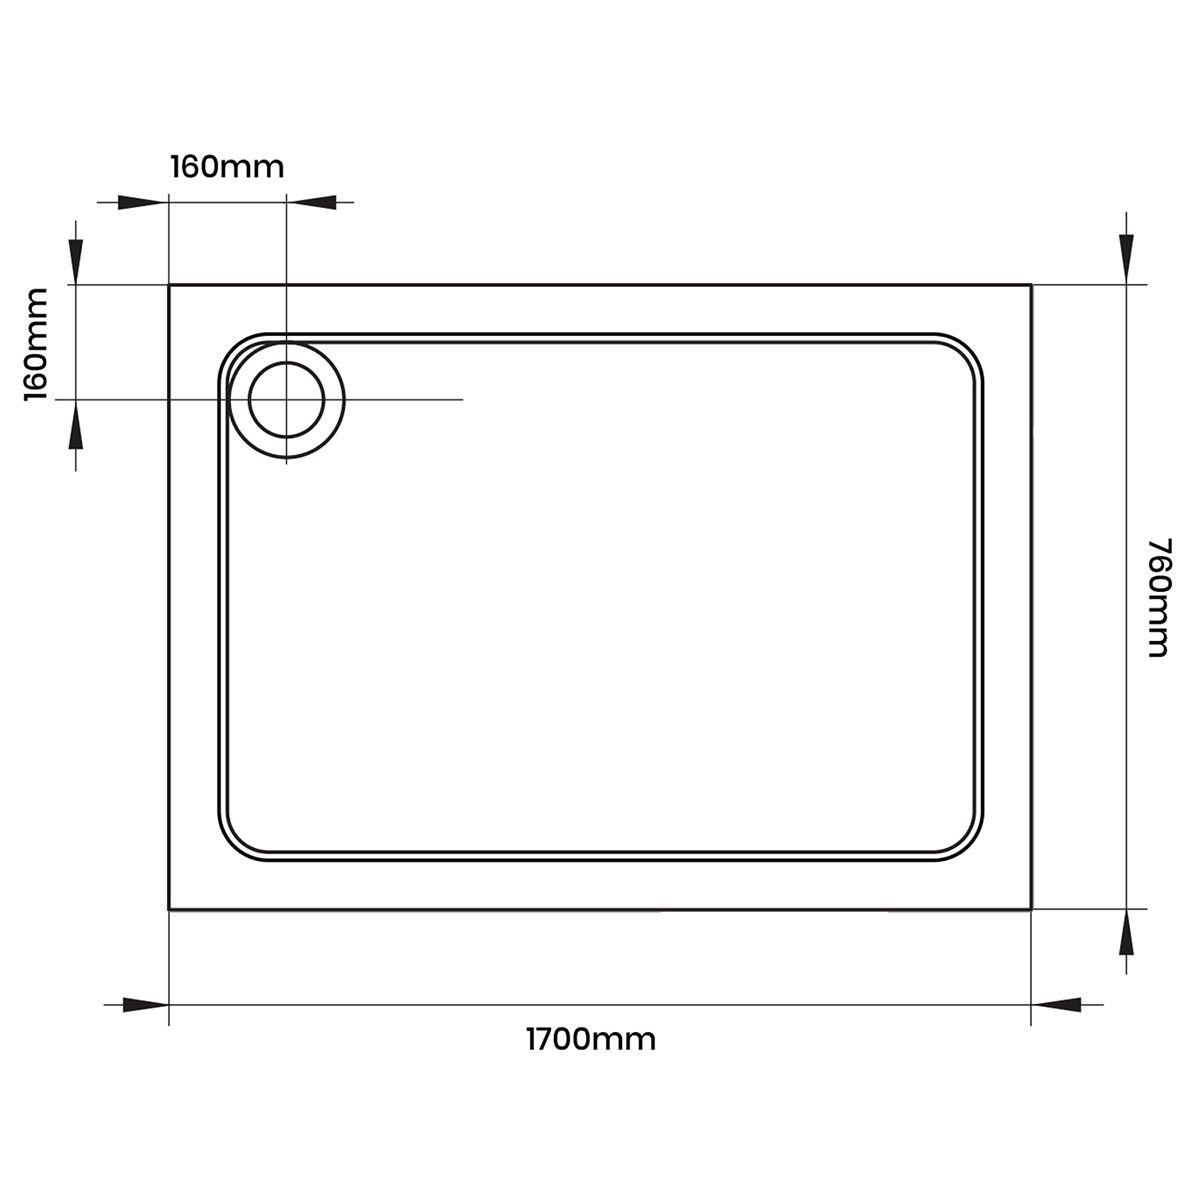 Aquadart Rectangular 1700 x 760 Shower Tray Dimensions